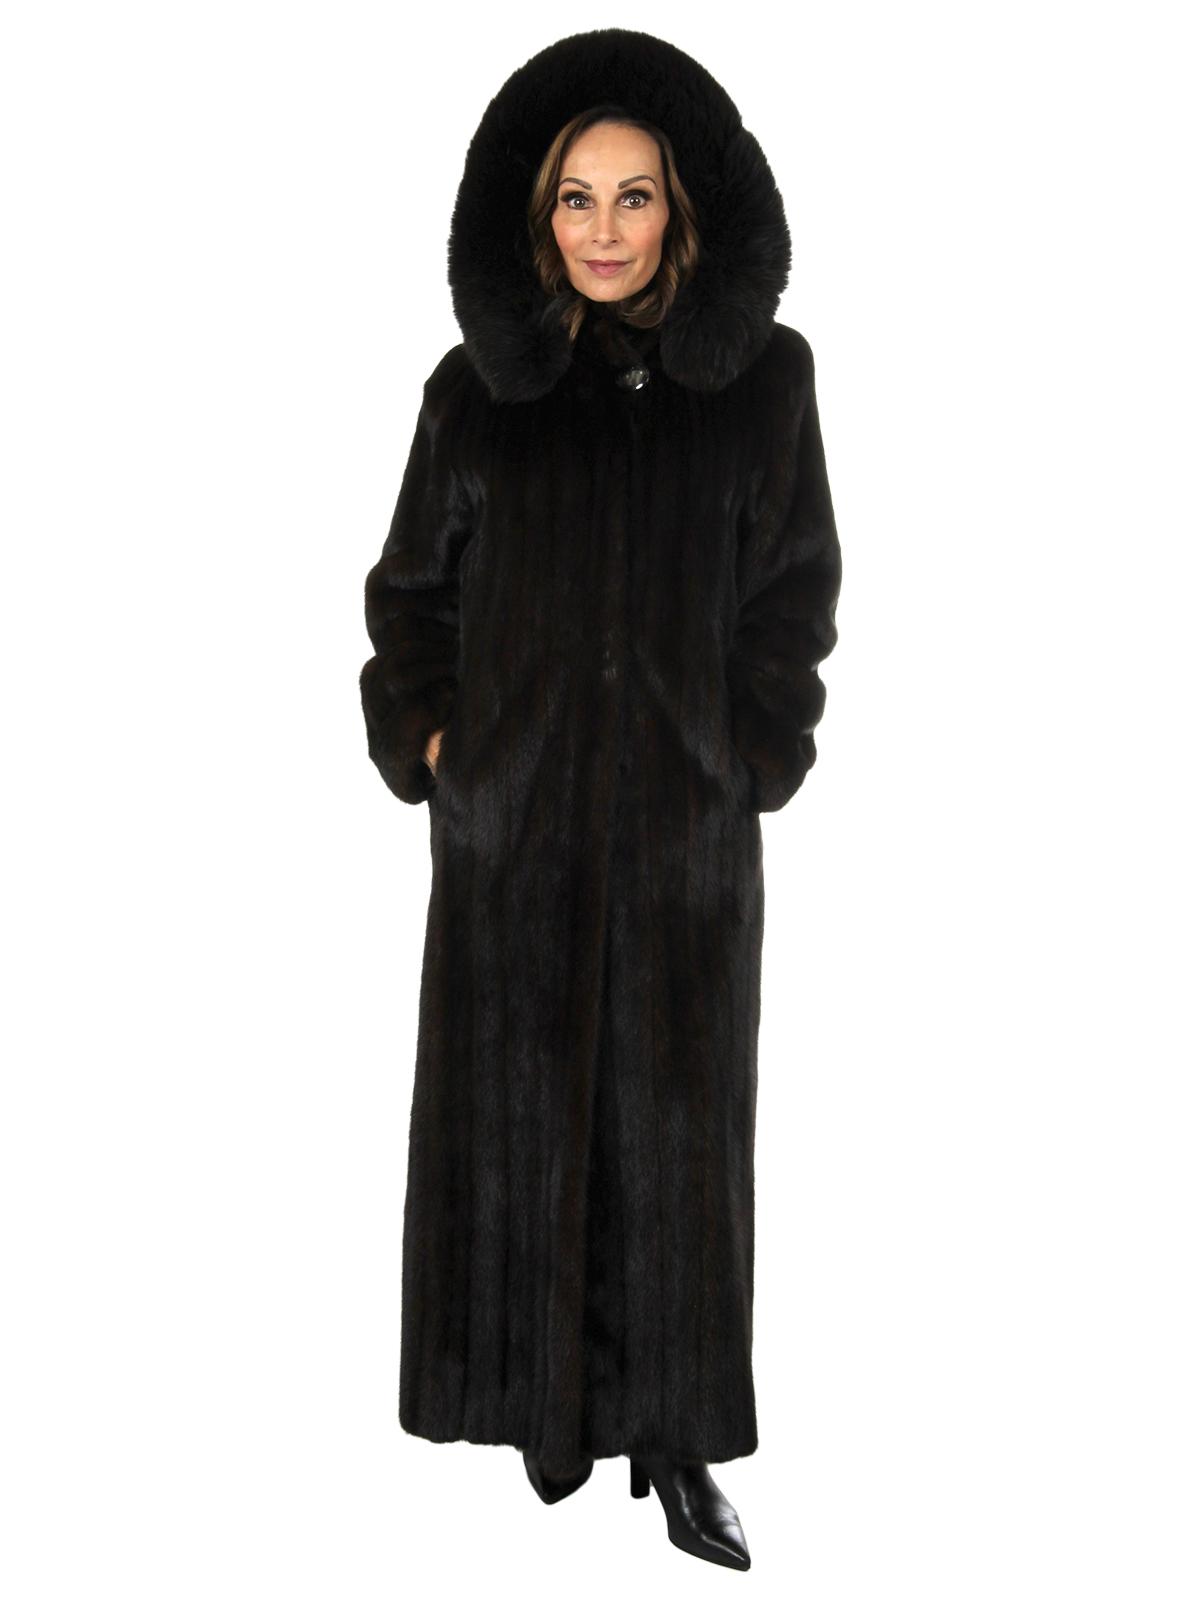 Woman's Deep Mahogany Female Mink Fur Coat with Hood